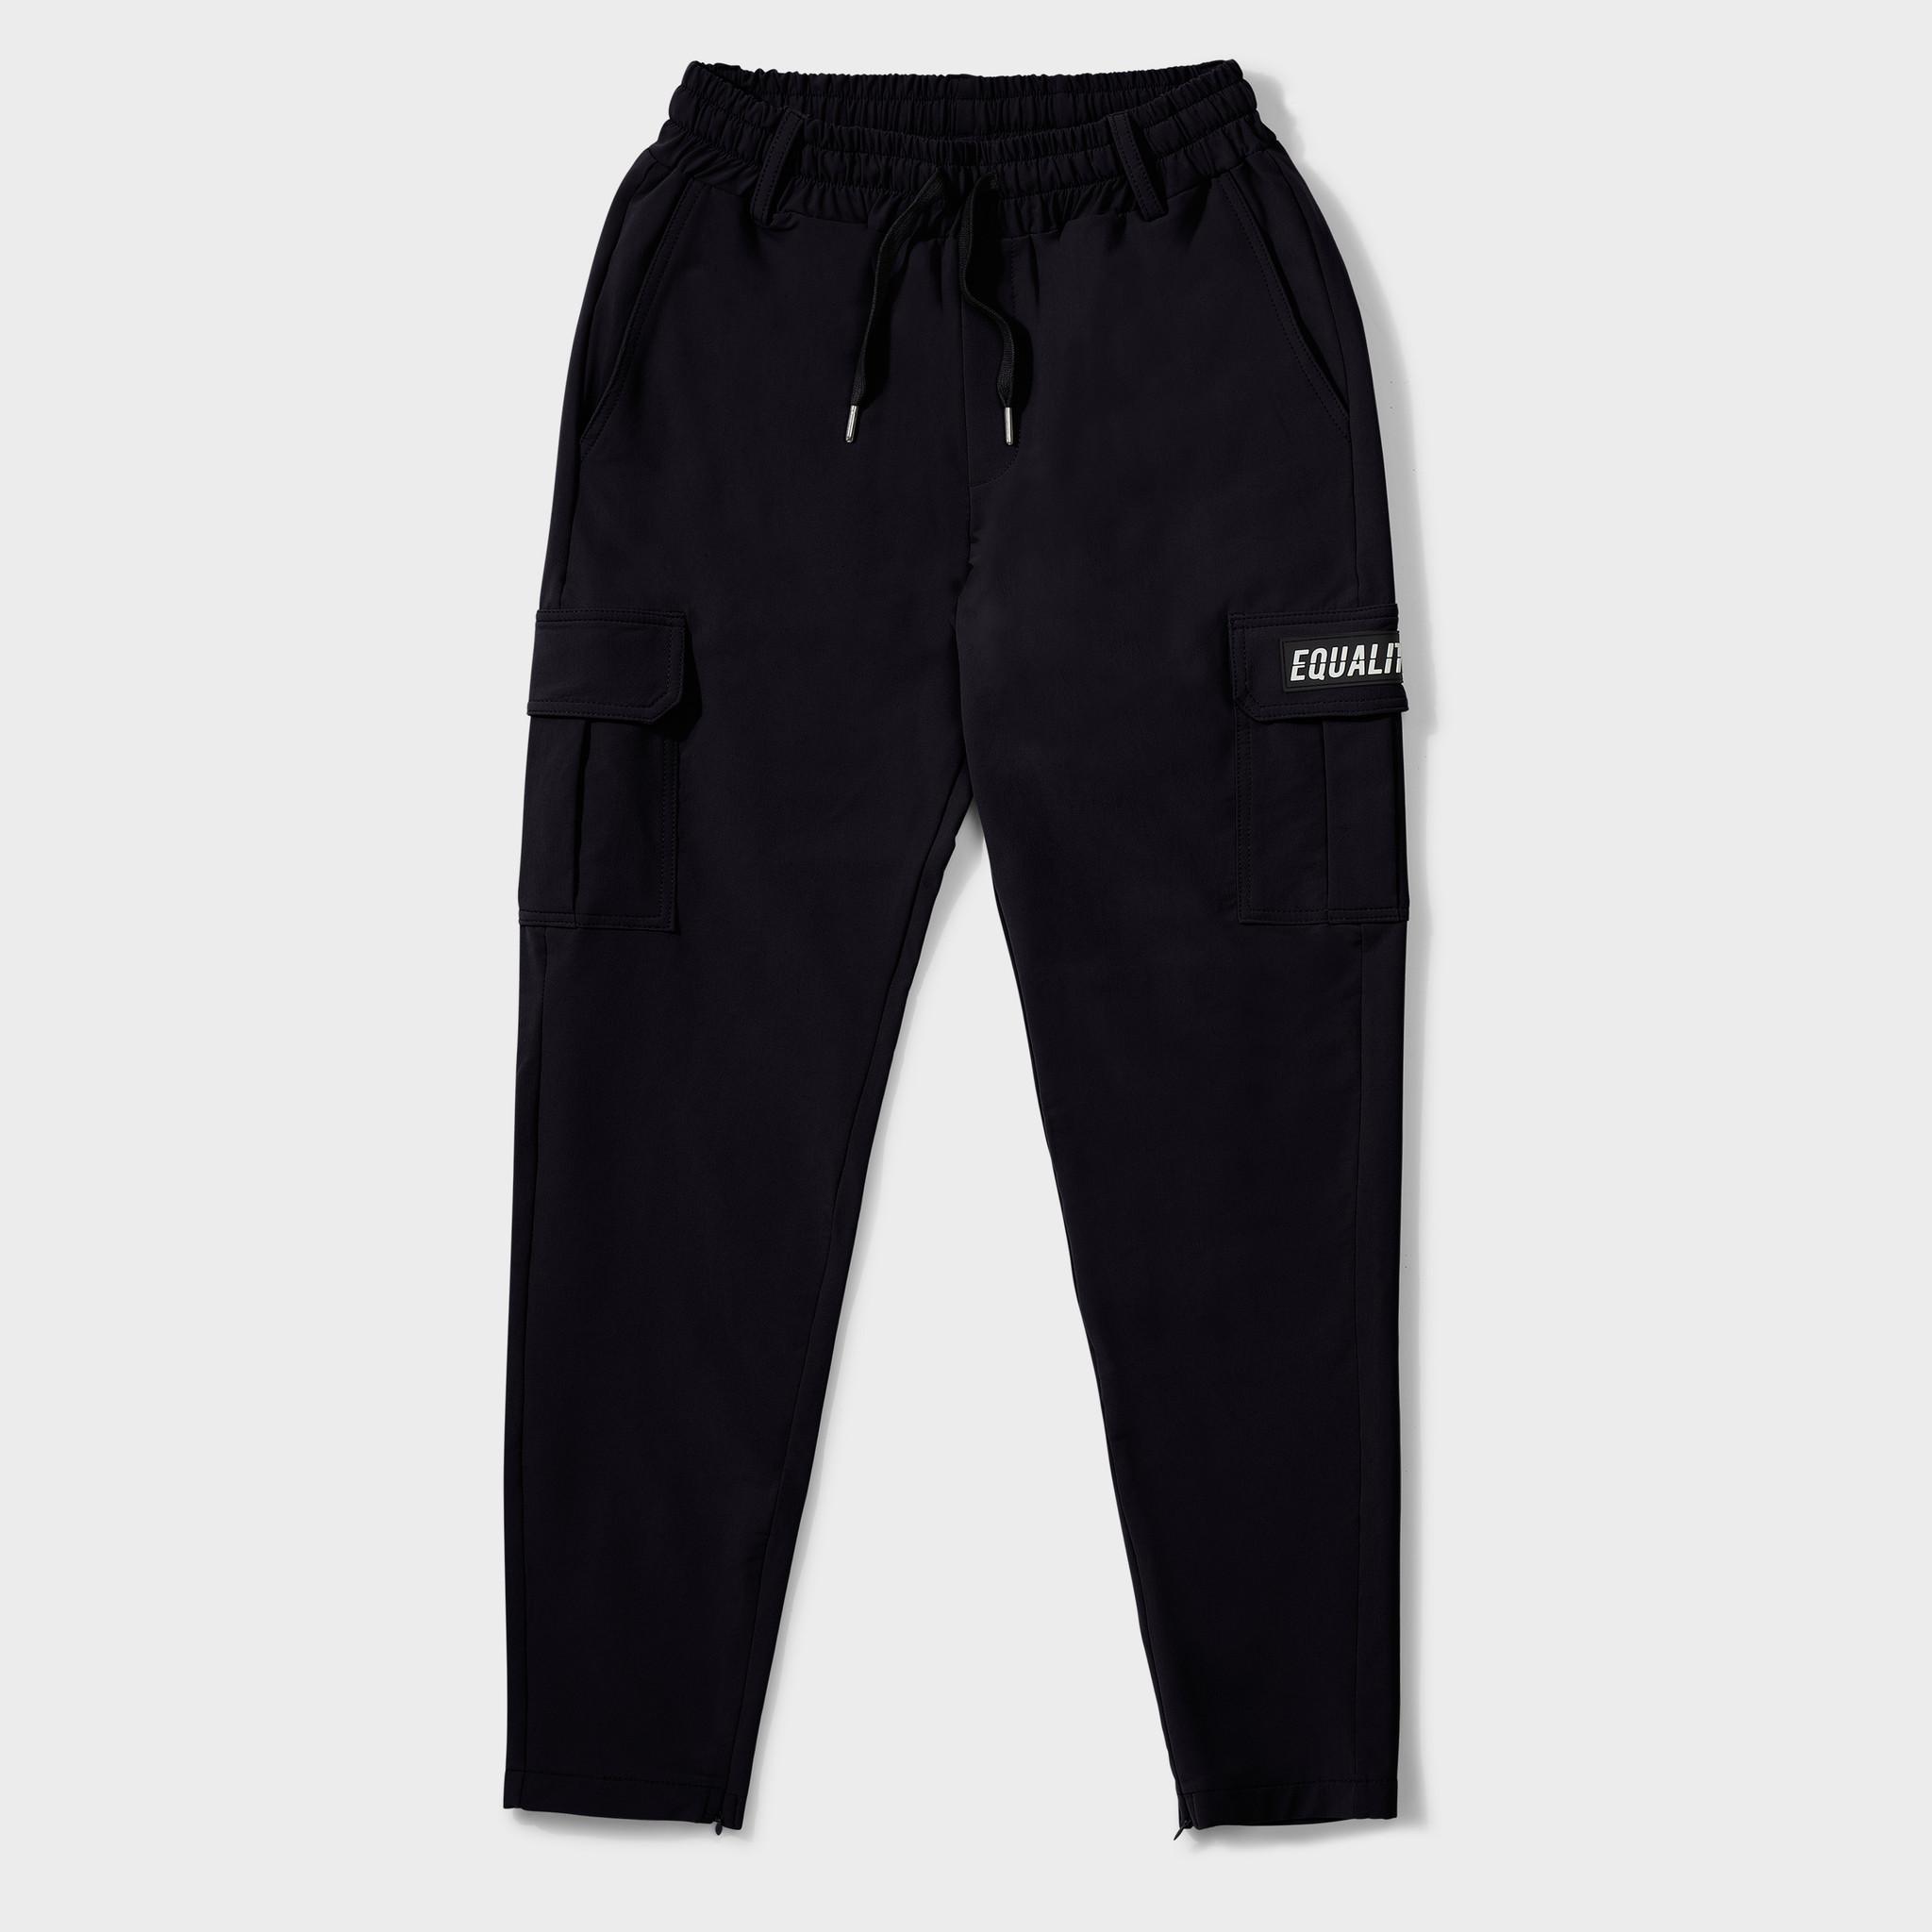 Cargo pants black-1